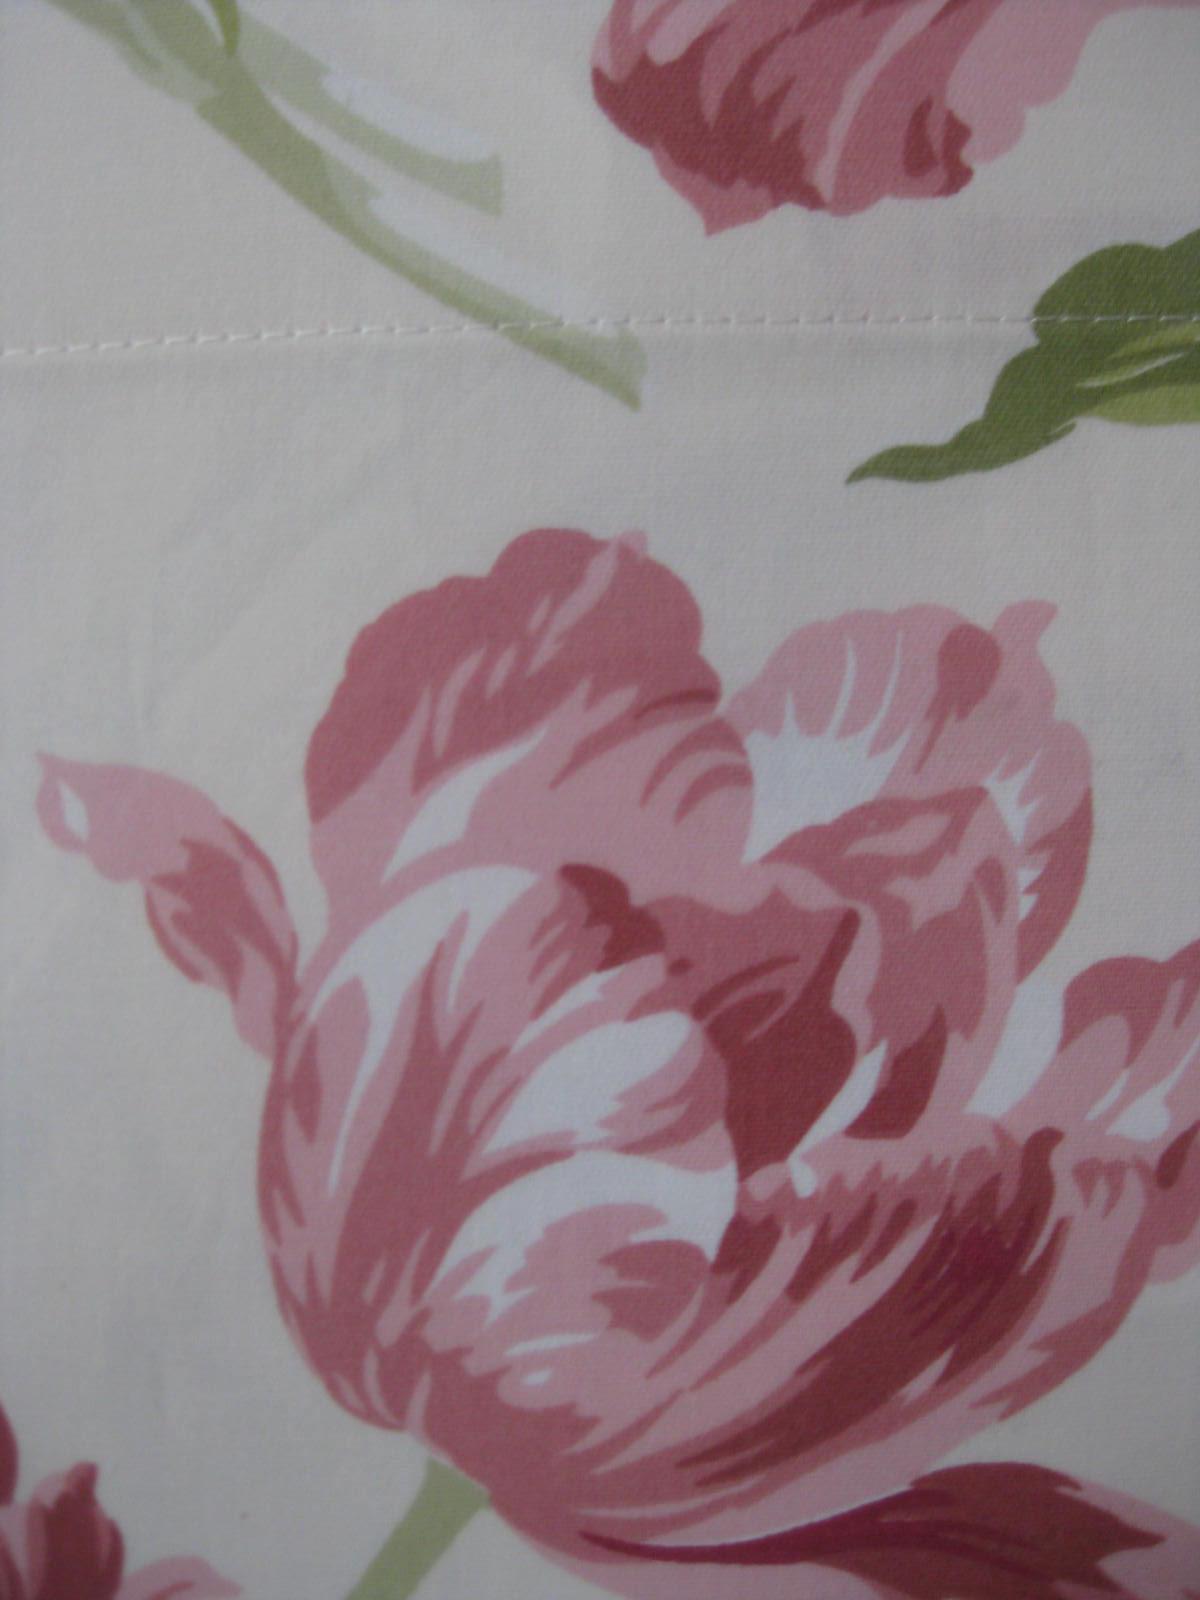 tagesdecke lakerton cranberry von laura ashley 240x265 cm. Black Bedroom Furniture Sets. Home Design Ideas